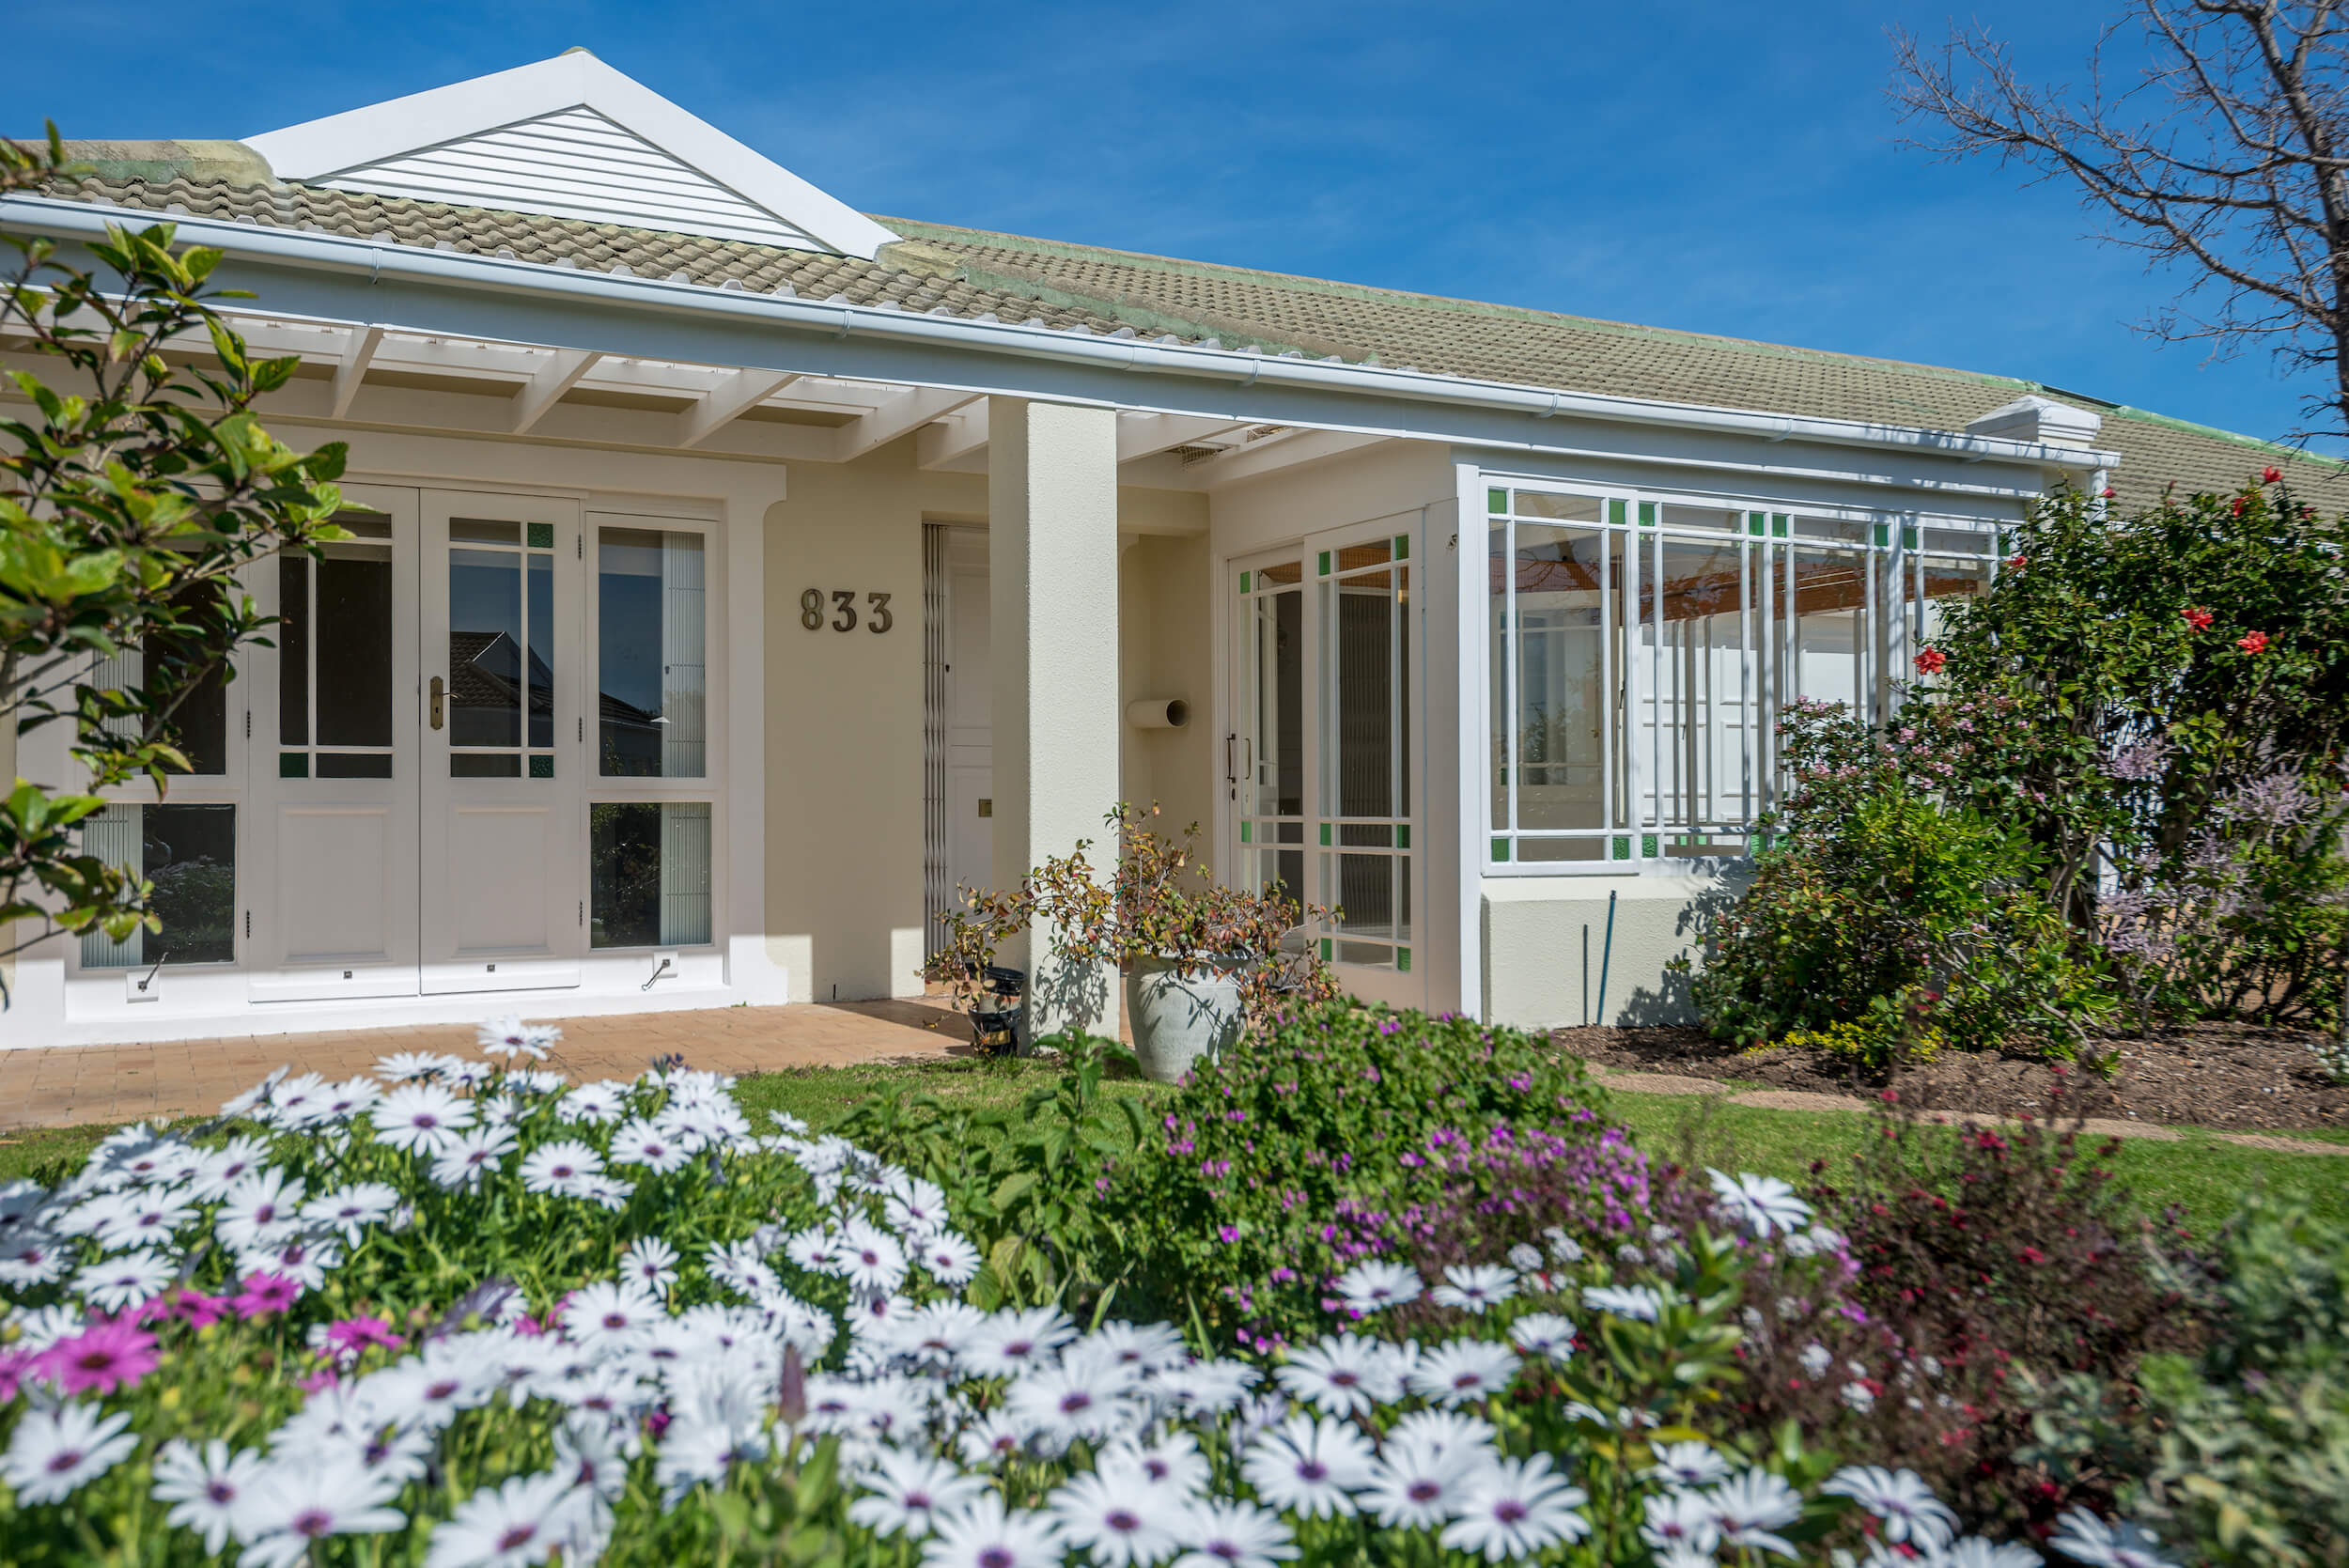 Cottage 833